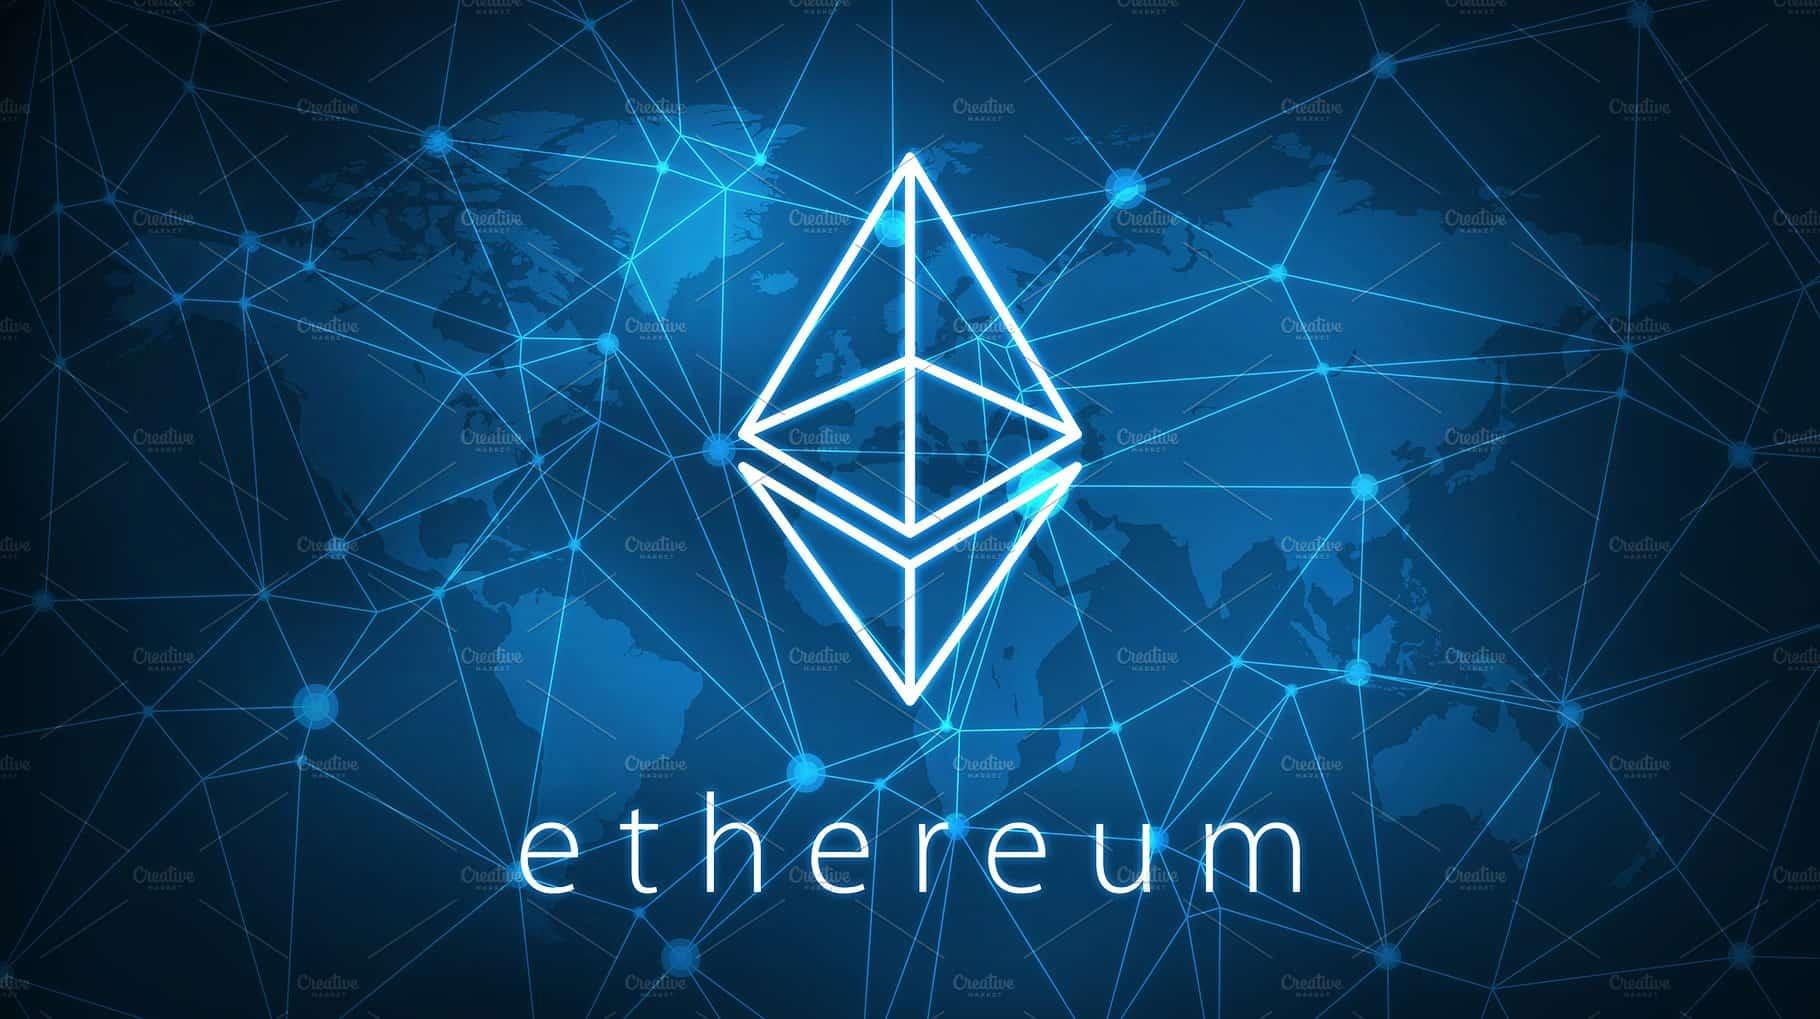 Ethereum Whales Make A Big Splash, Transfer 100,000 ETH in 24 Hours